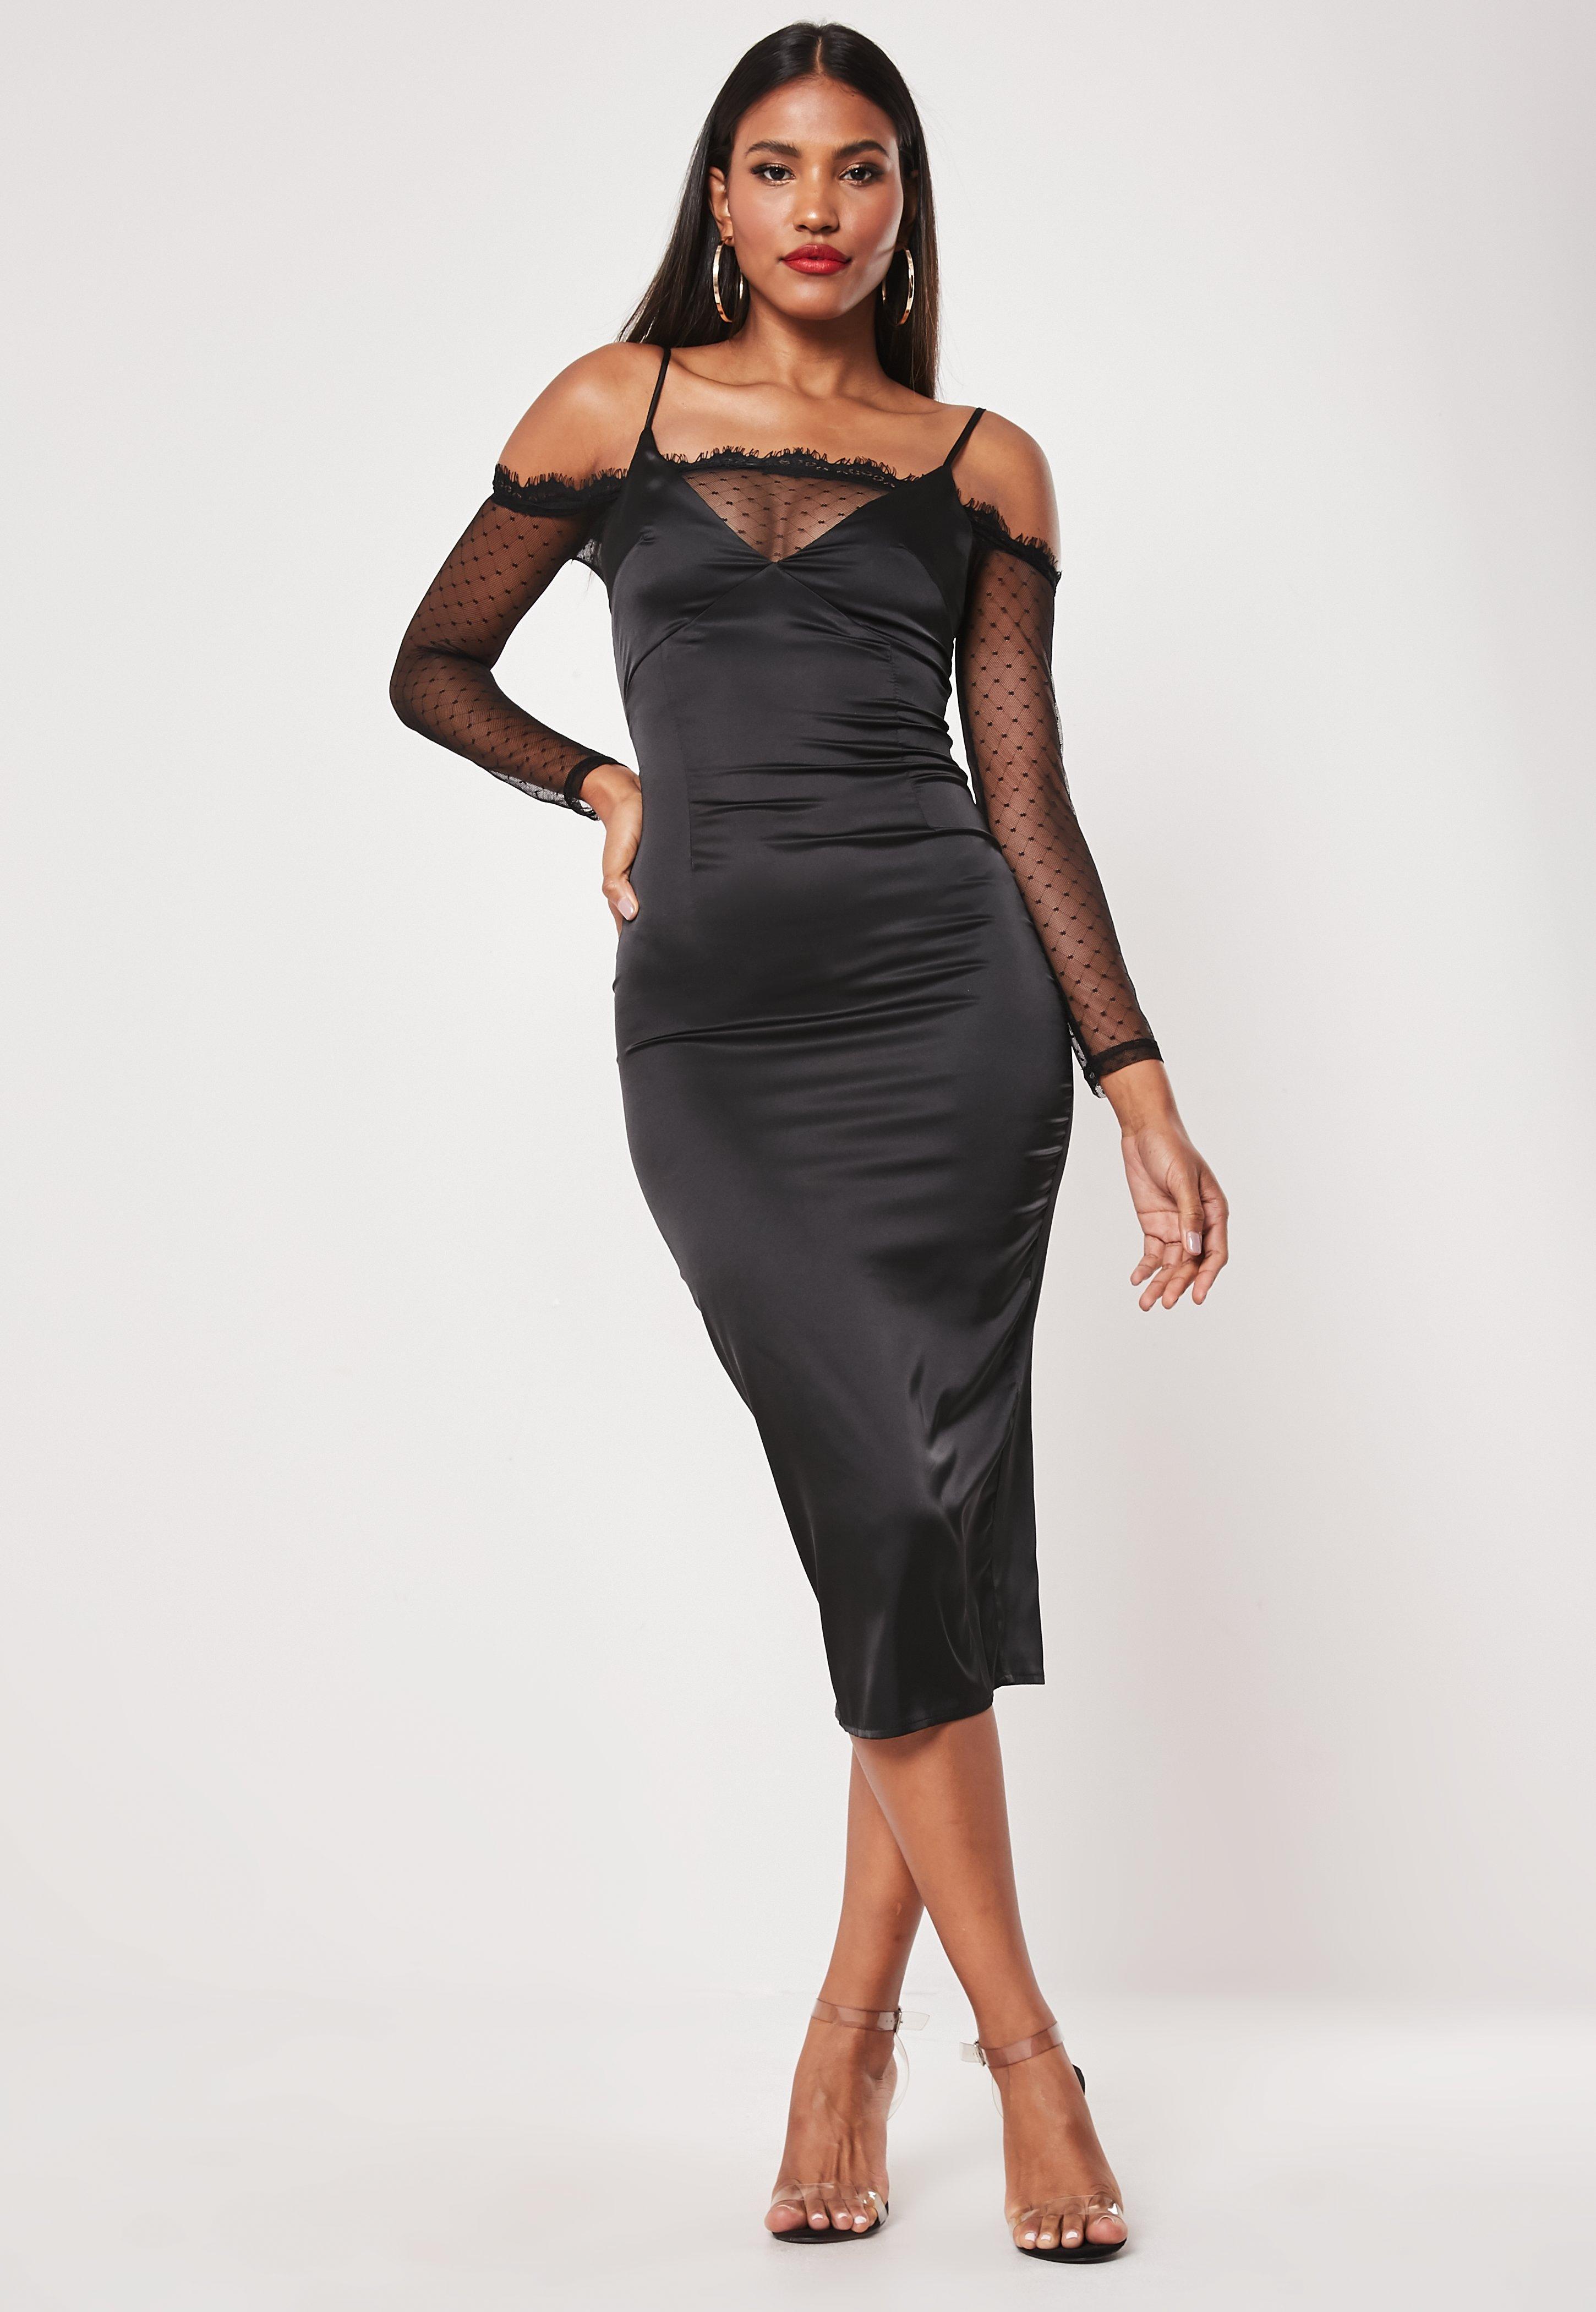 4d23236b35f2 Lace Dresses | Long Sleeve Lace Dresses - Missguided Australia